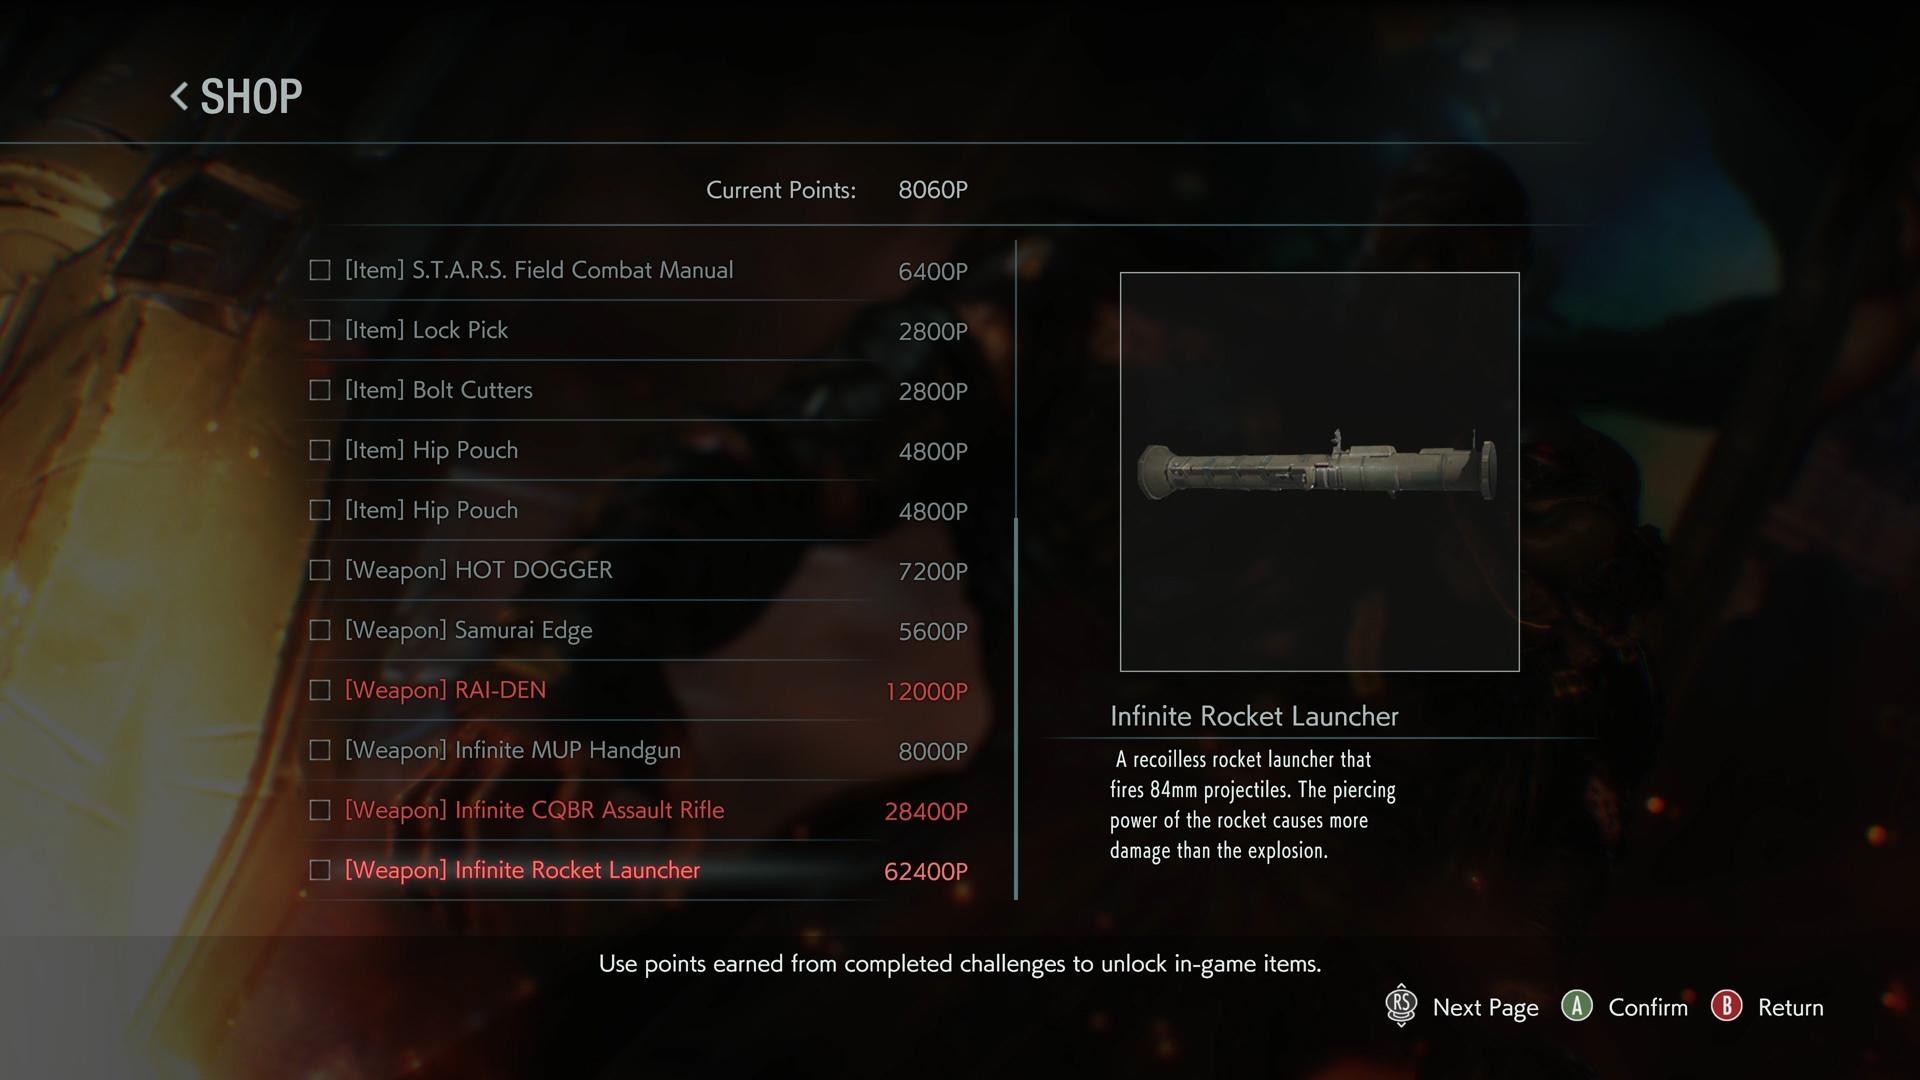 Resident Evil 3 shop infinite ammo rocket launcher